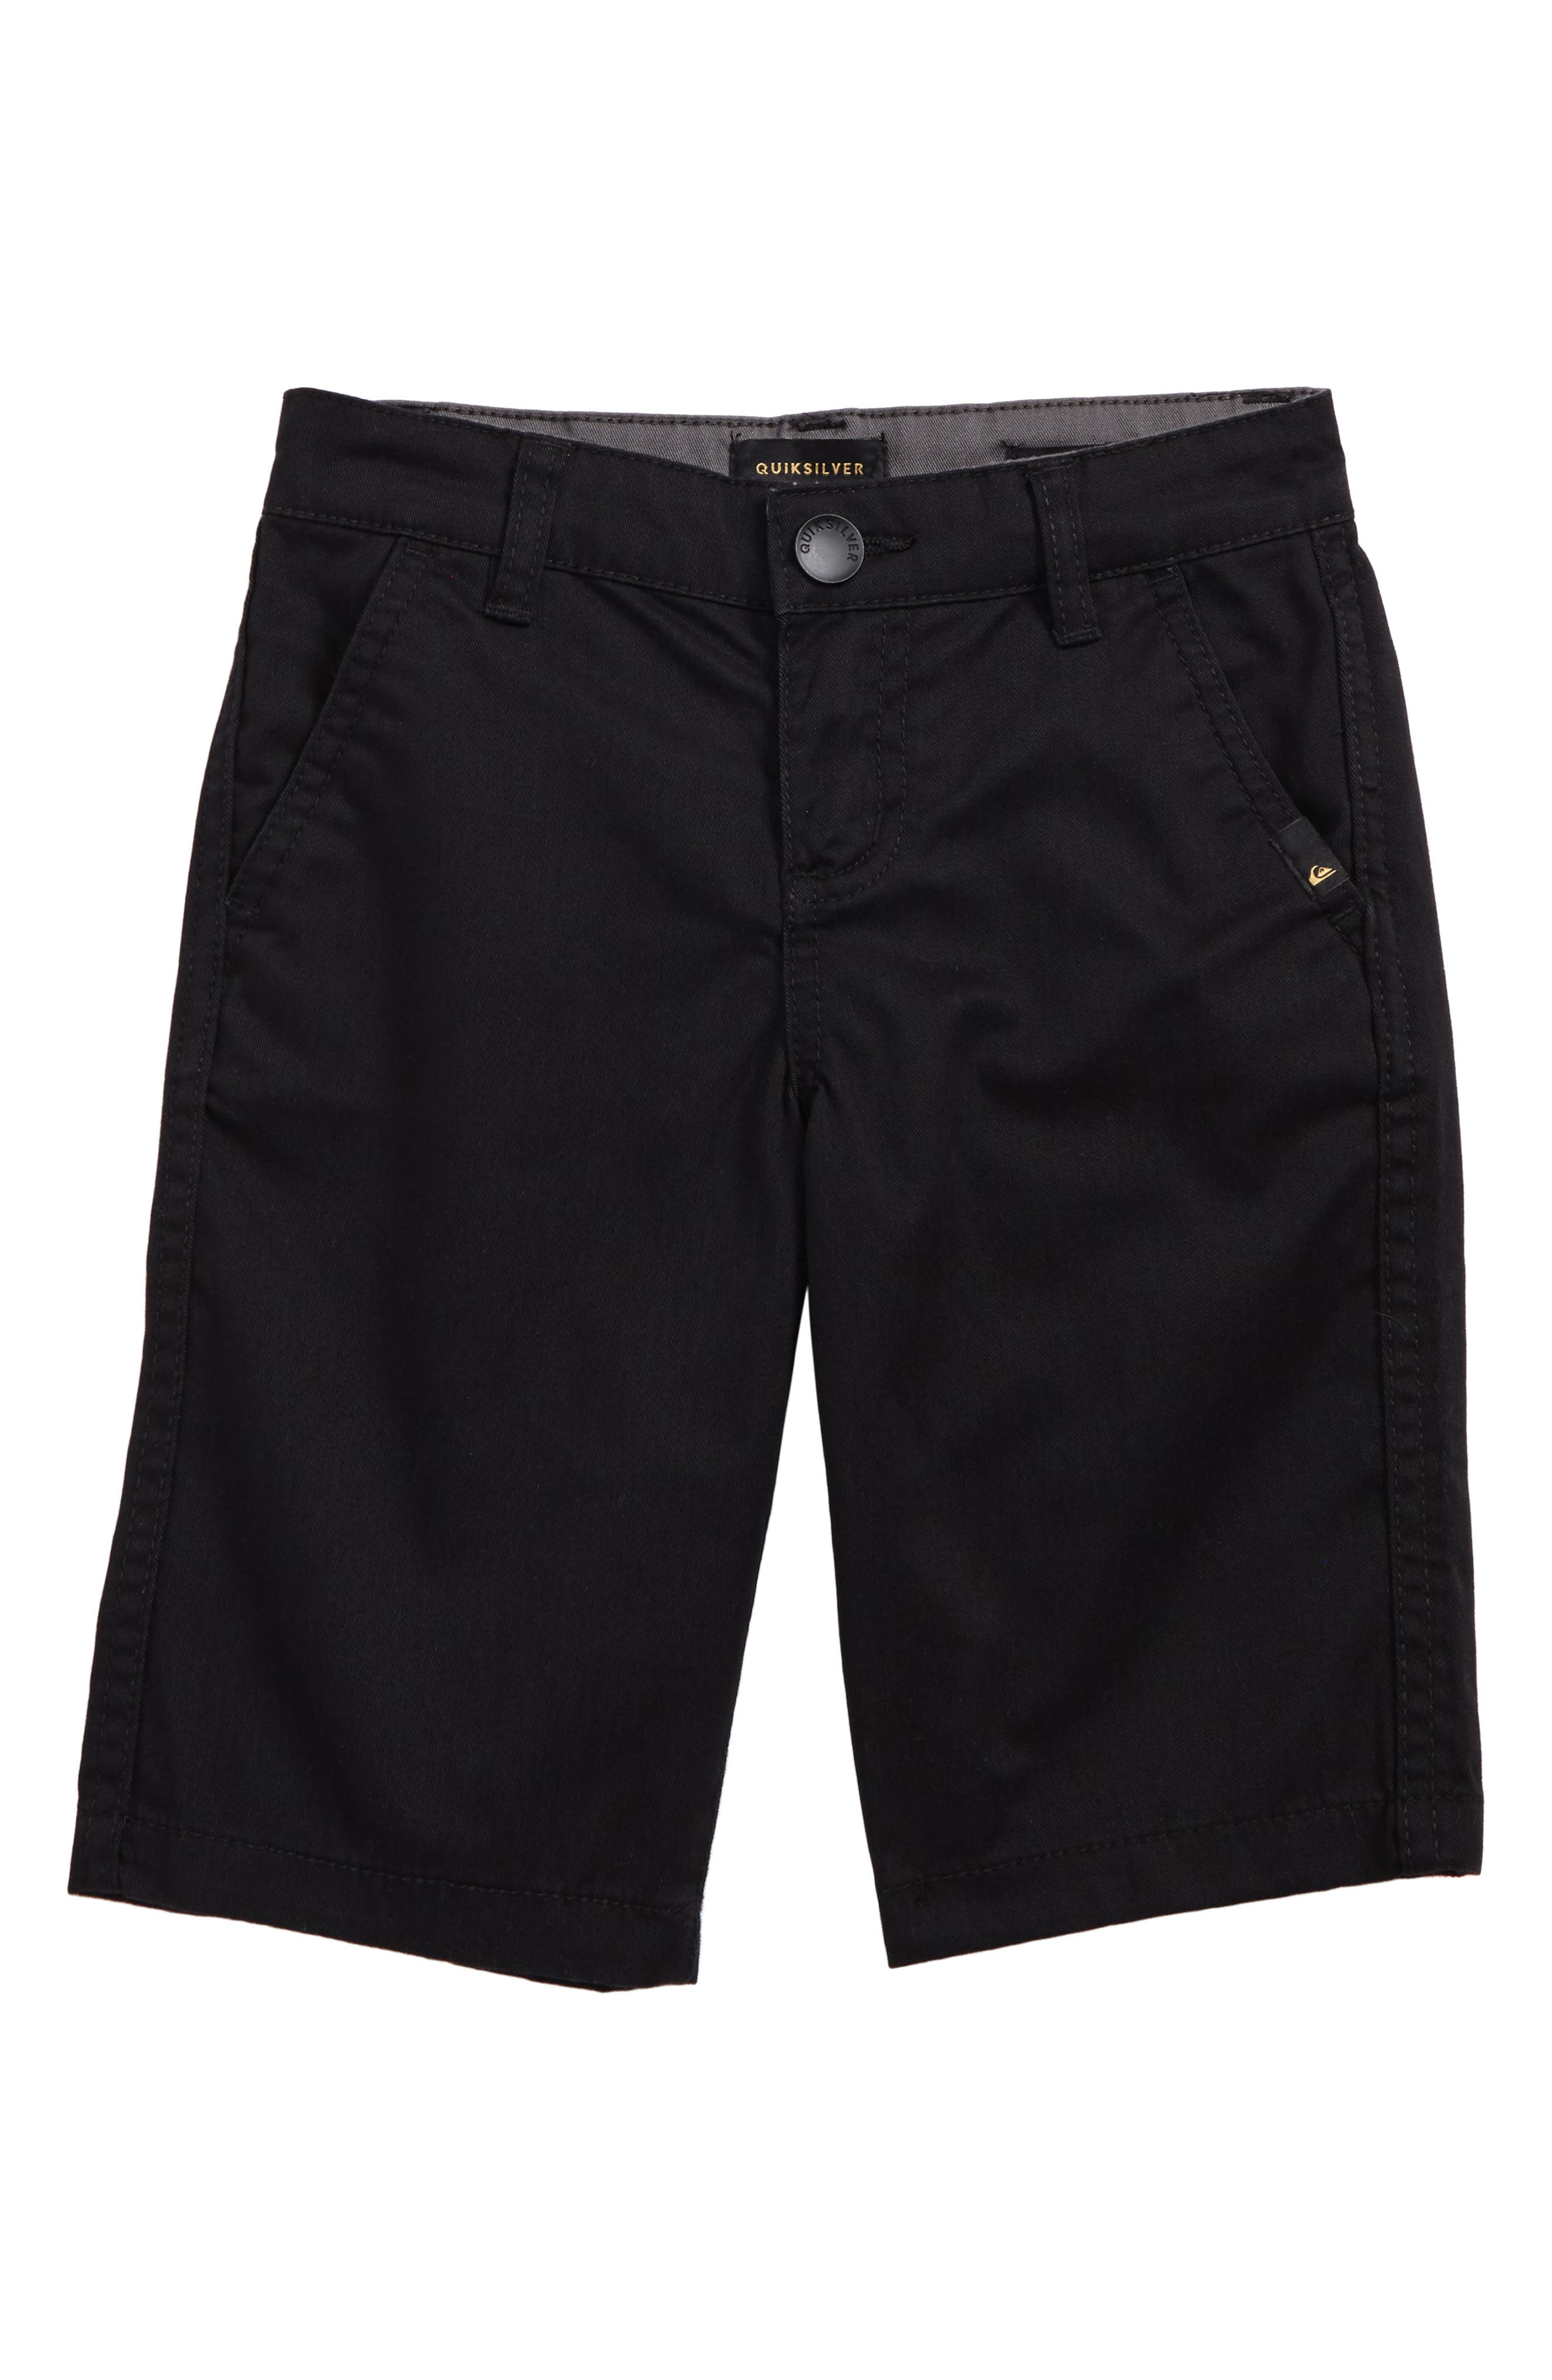 Everyday Union Shorts,                             Main thumbnail 1, color,                             002